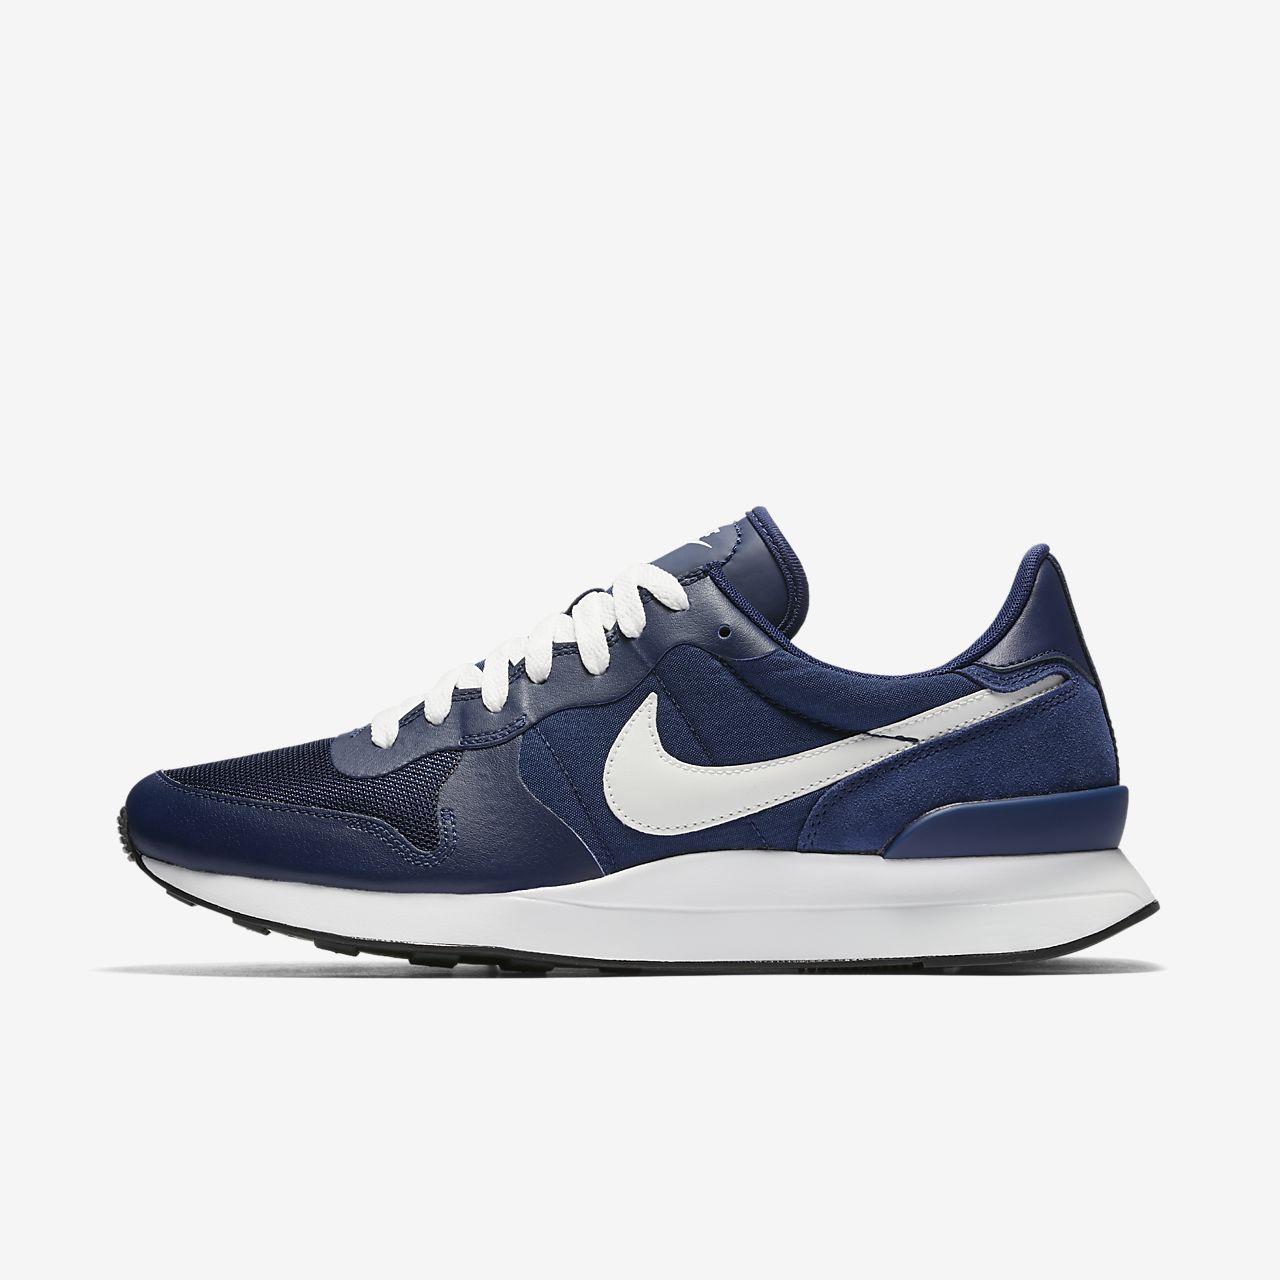 Nike Chaussures Internationalist Sd Lt17 Nike soldes Wp0jR3u